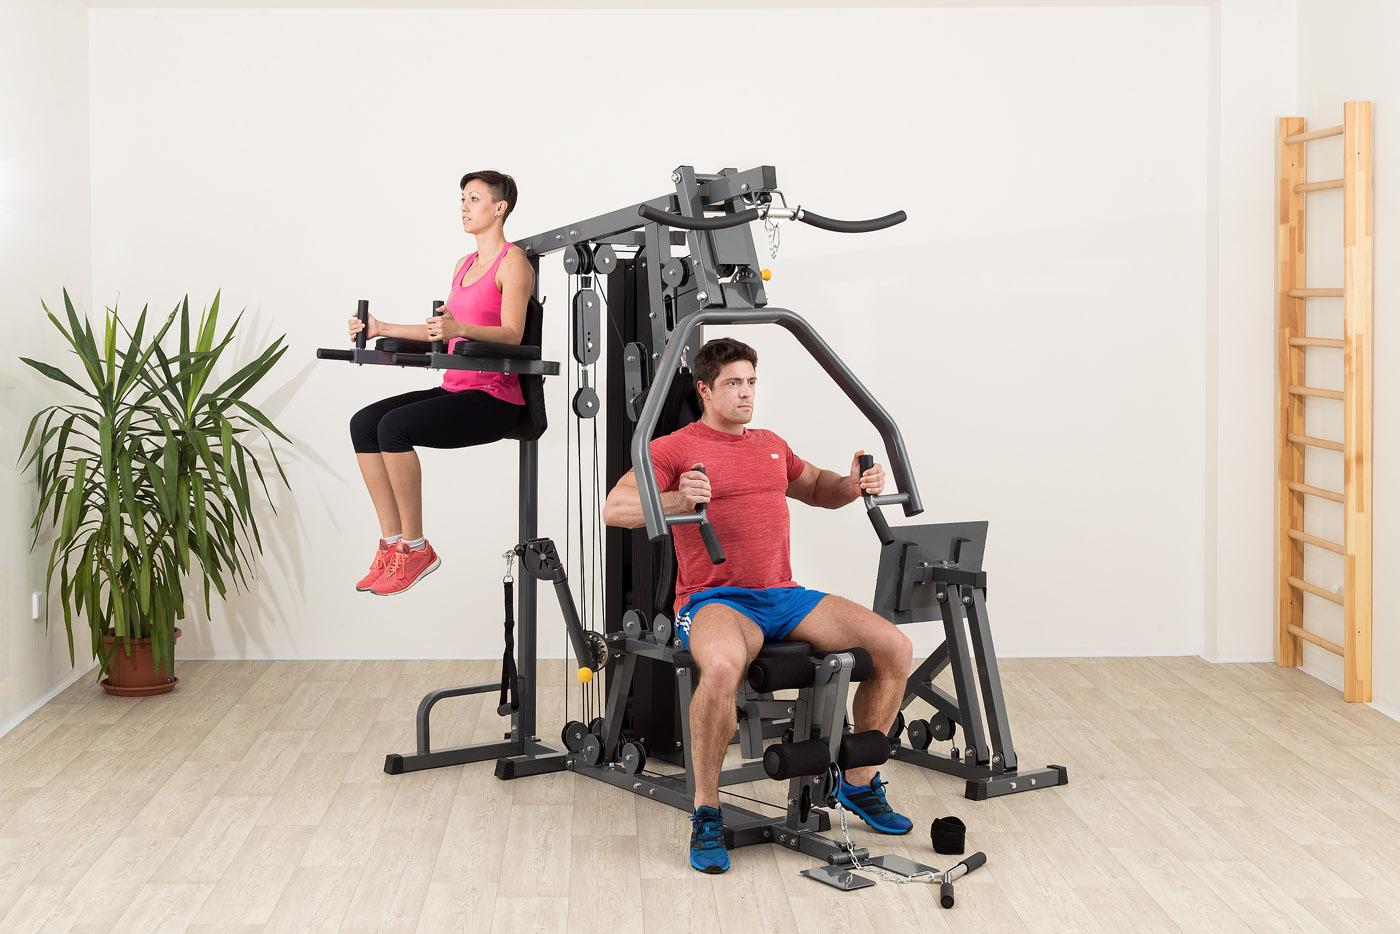 TRINFIT Gym GX7 PR cvik_1